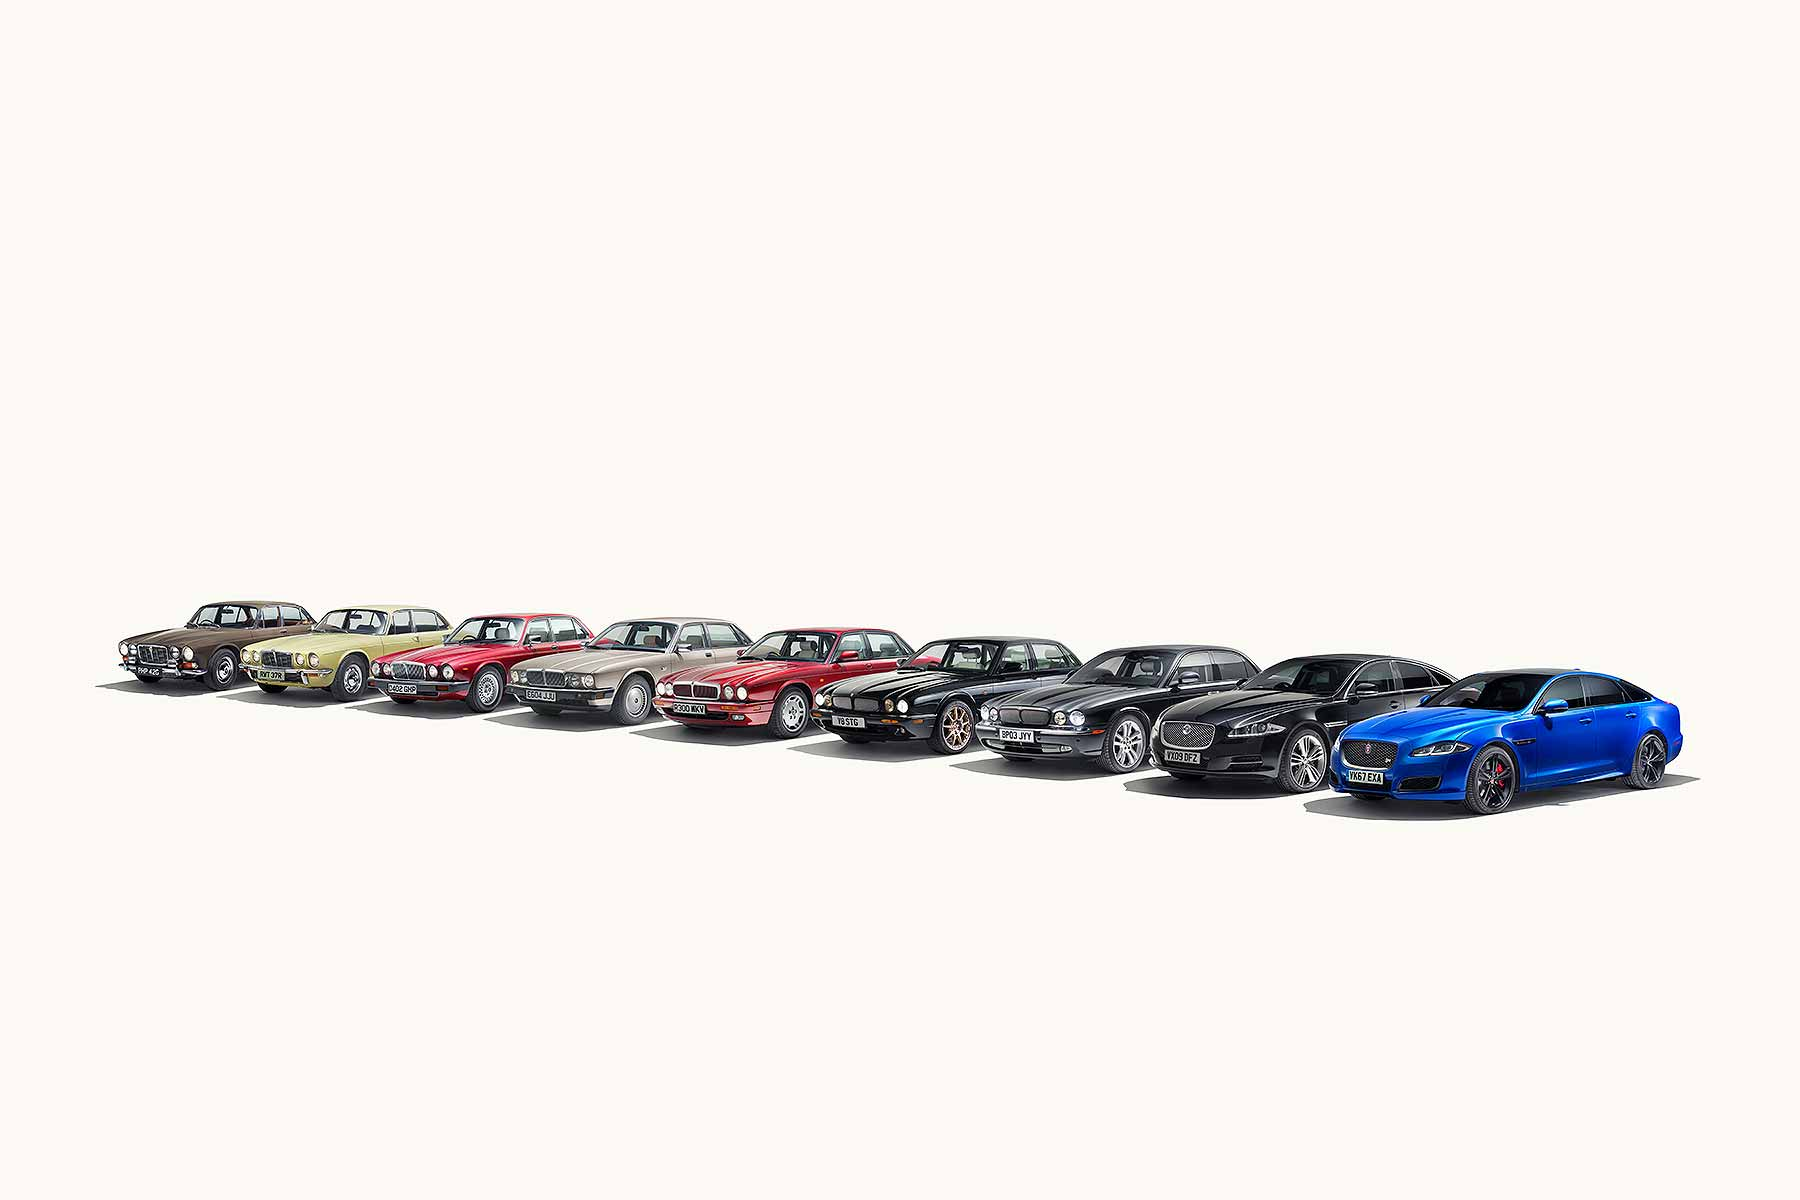 Jaguar XJ 50 years line-up